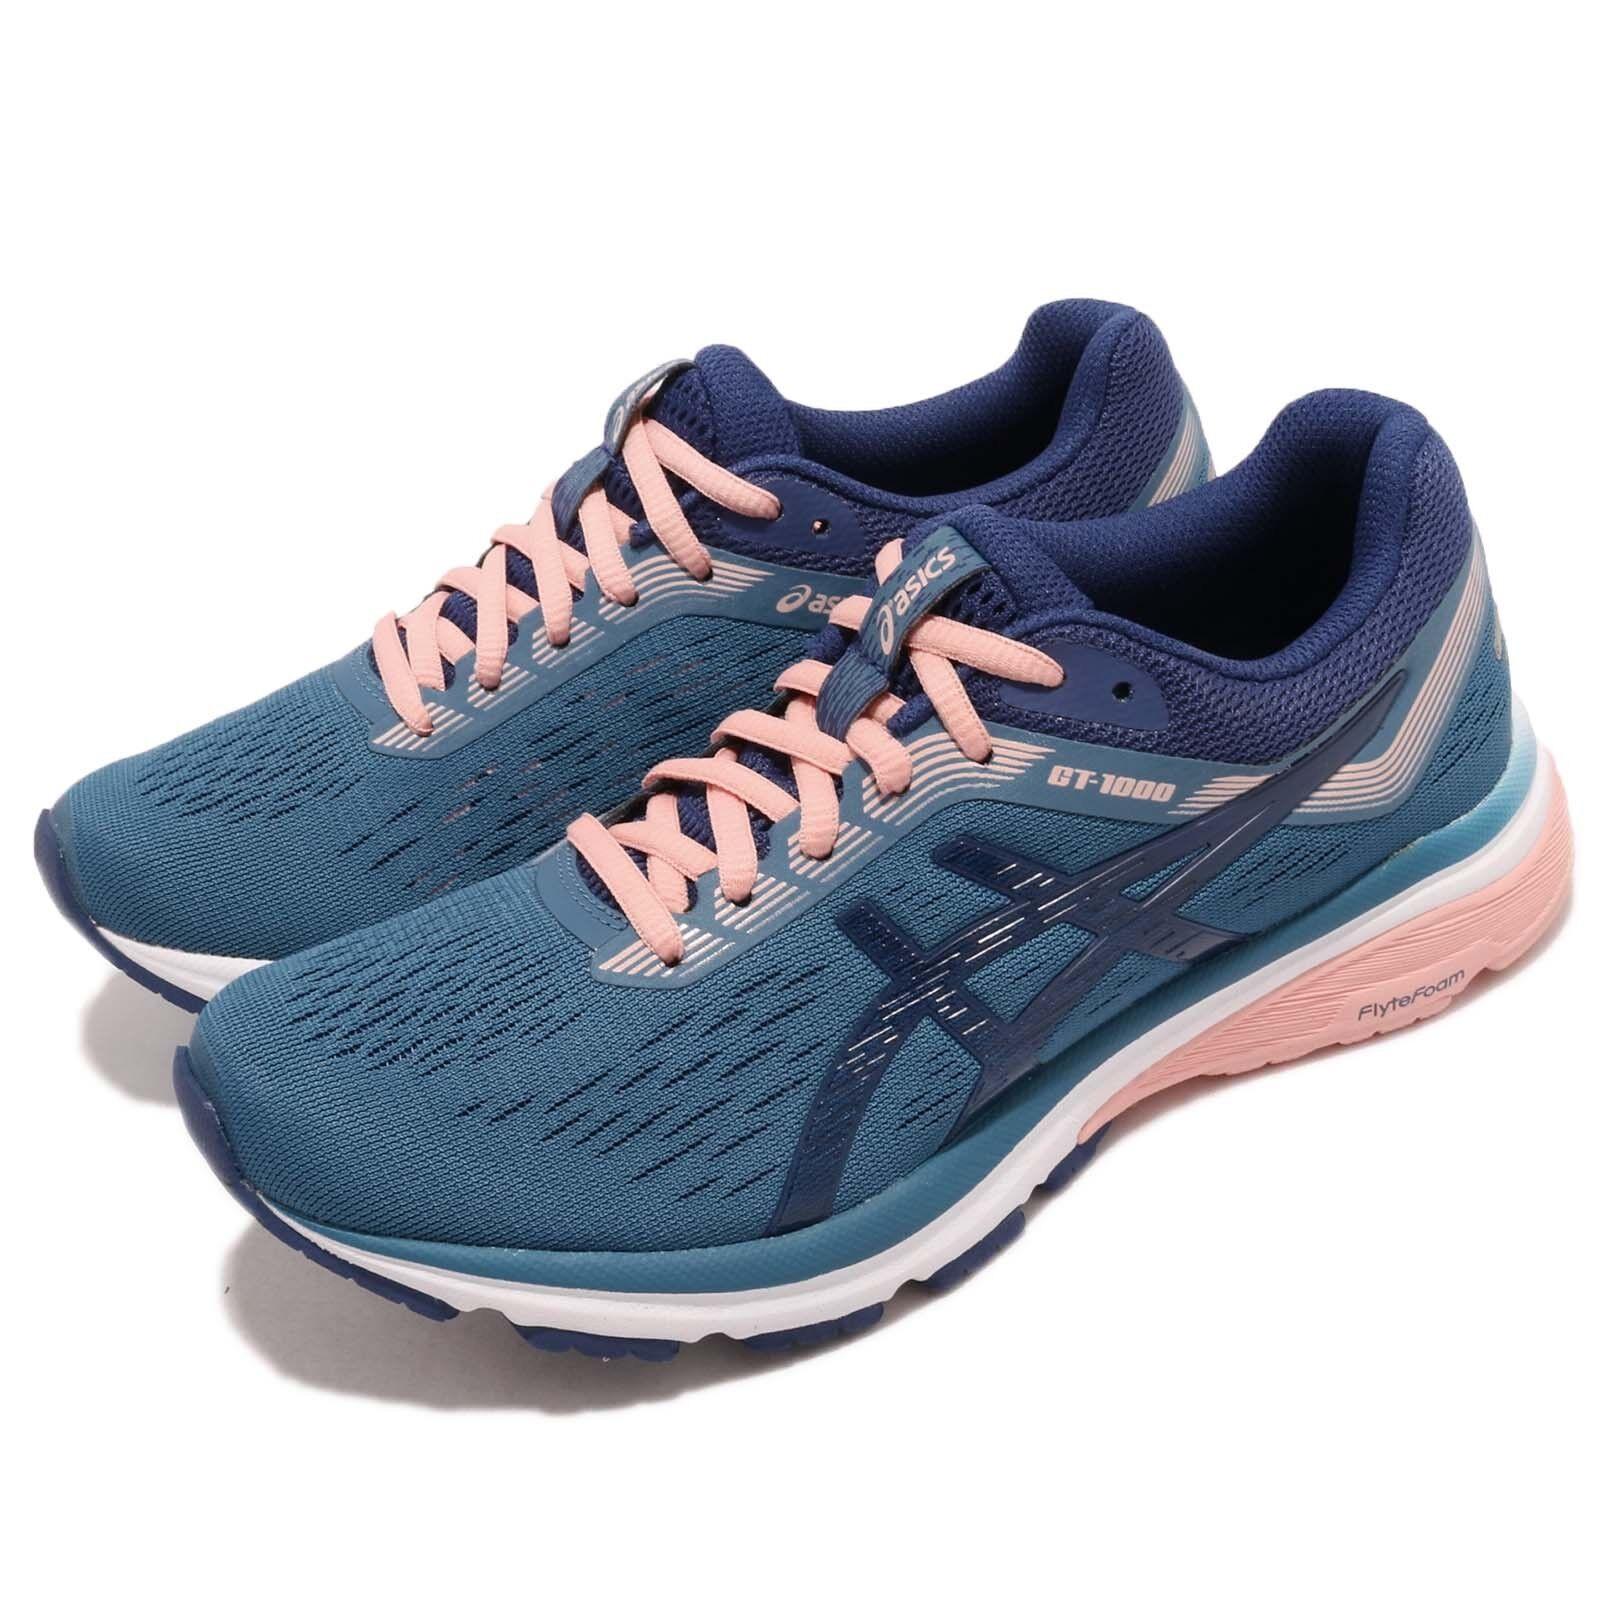 Asics  GT-1000 7 blueee Pink Gel FlyteFoam Womens Running shoes 1012A030-400  incredible discounts